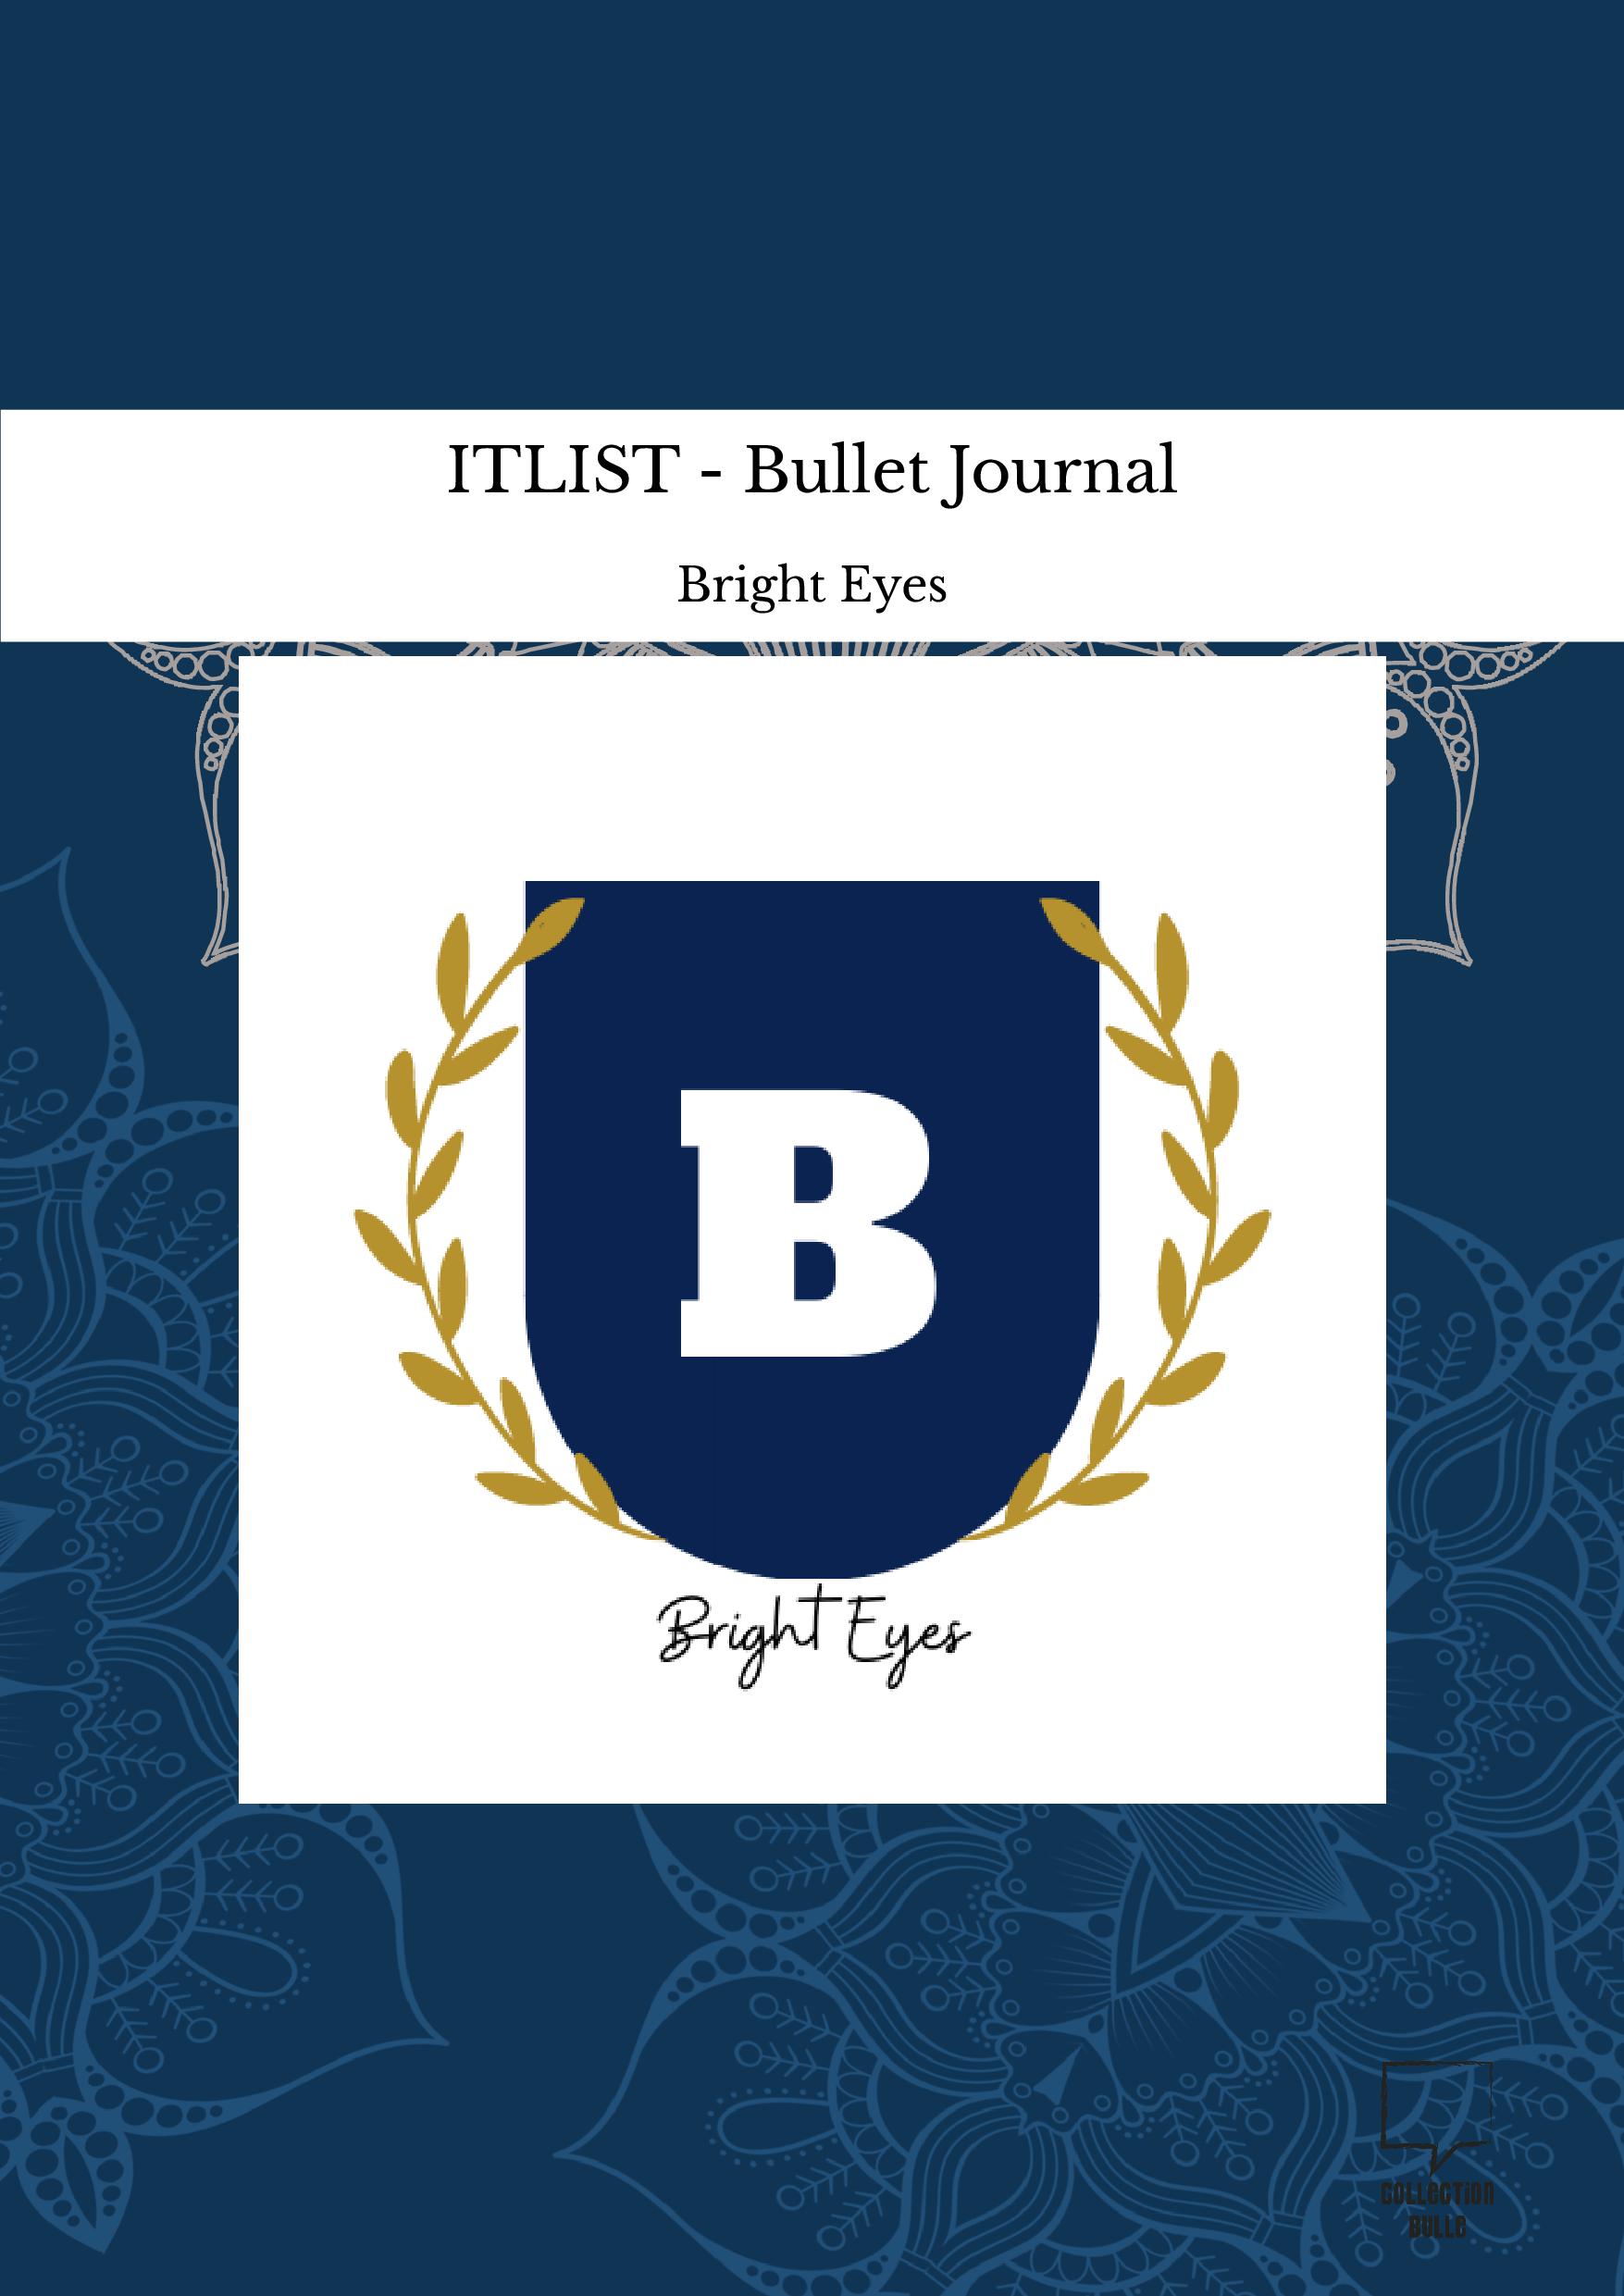 ITLIST - Bullet Journal